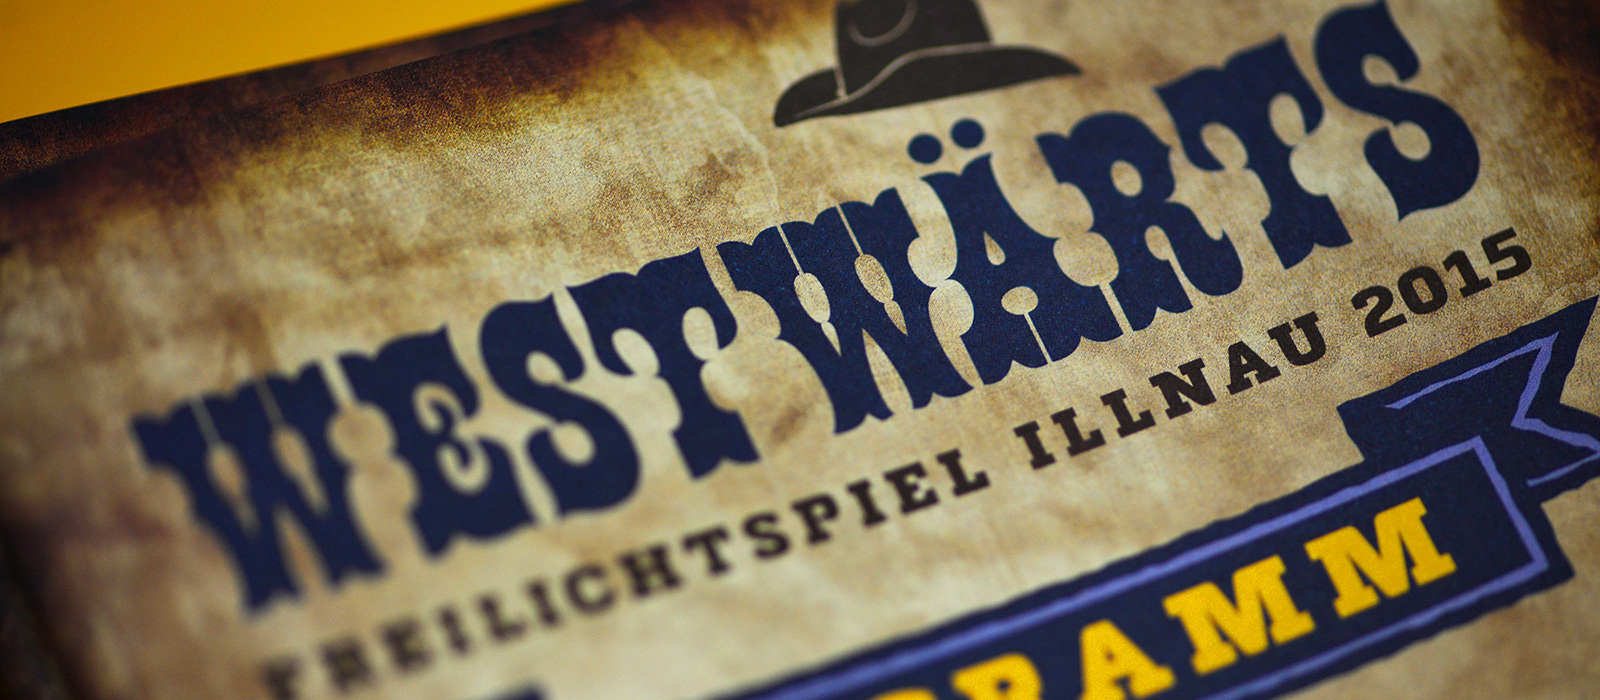 westwaerts_logo_8155.jpg